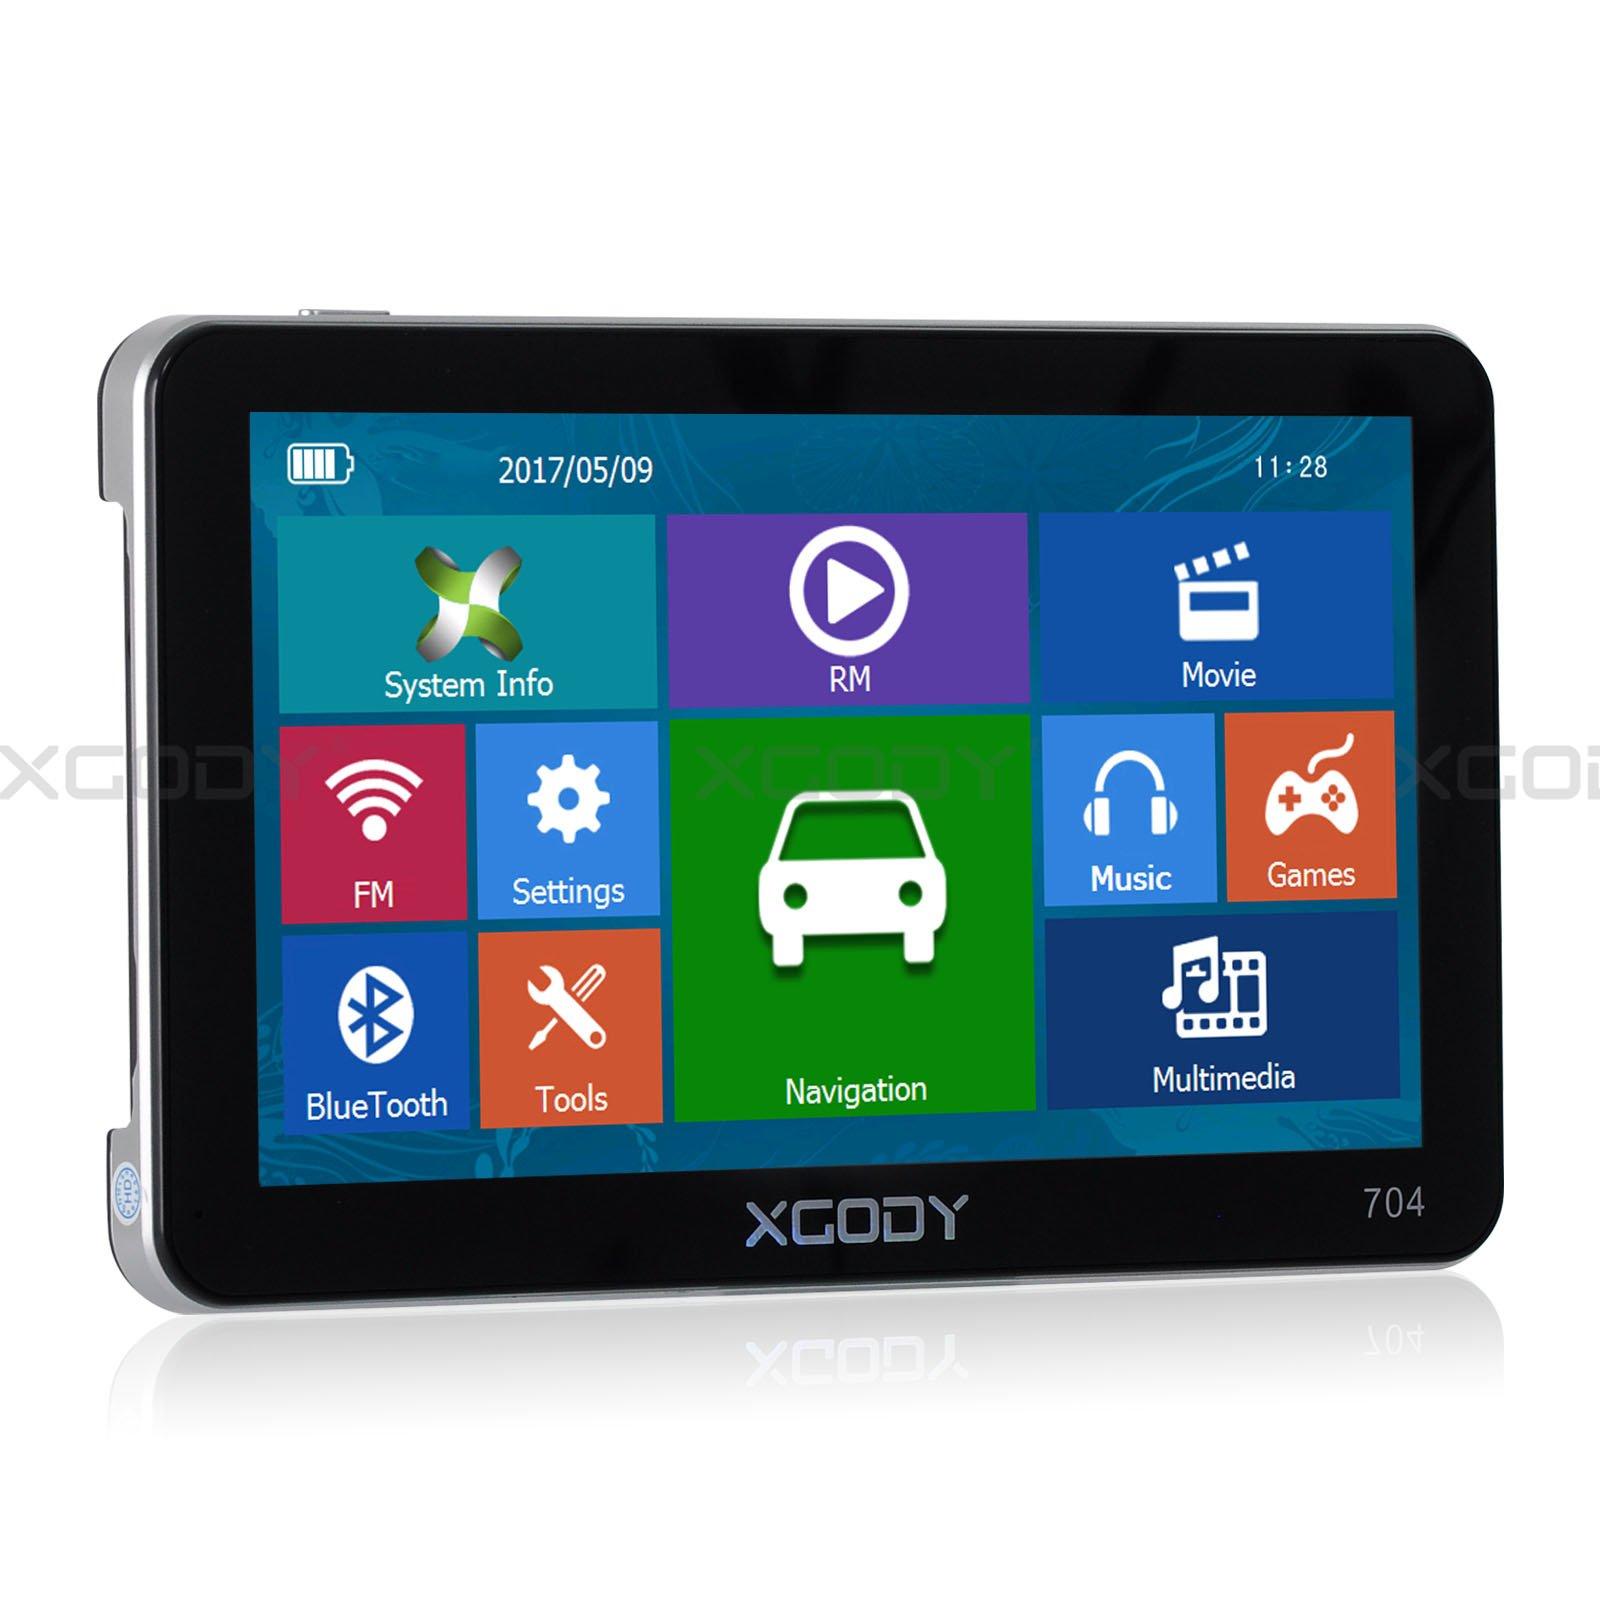 XGody 704 Capacitive Touch Rear Camera Car Navigator